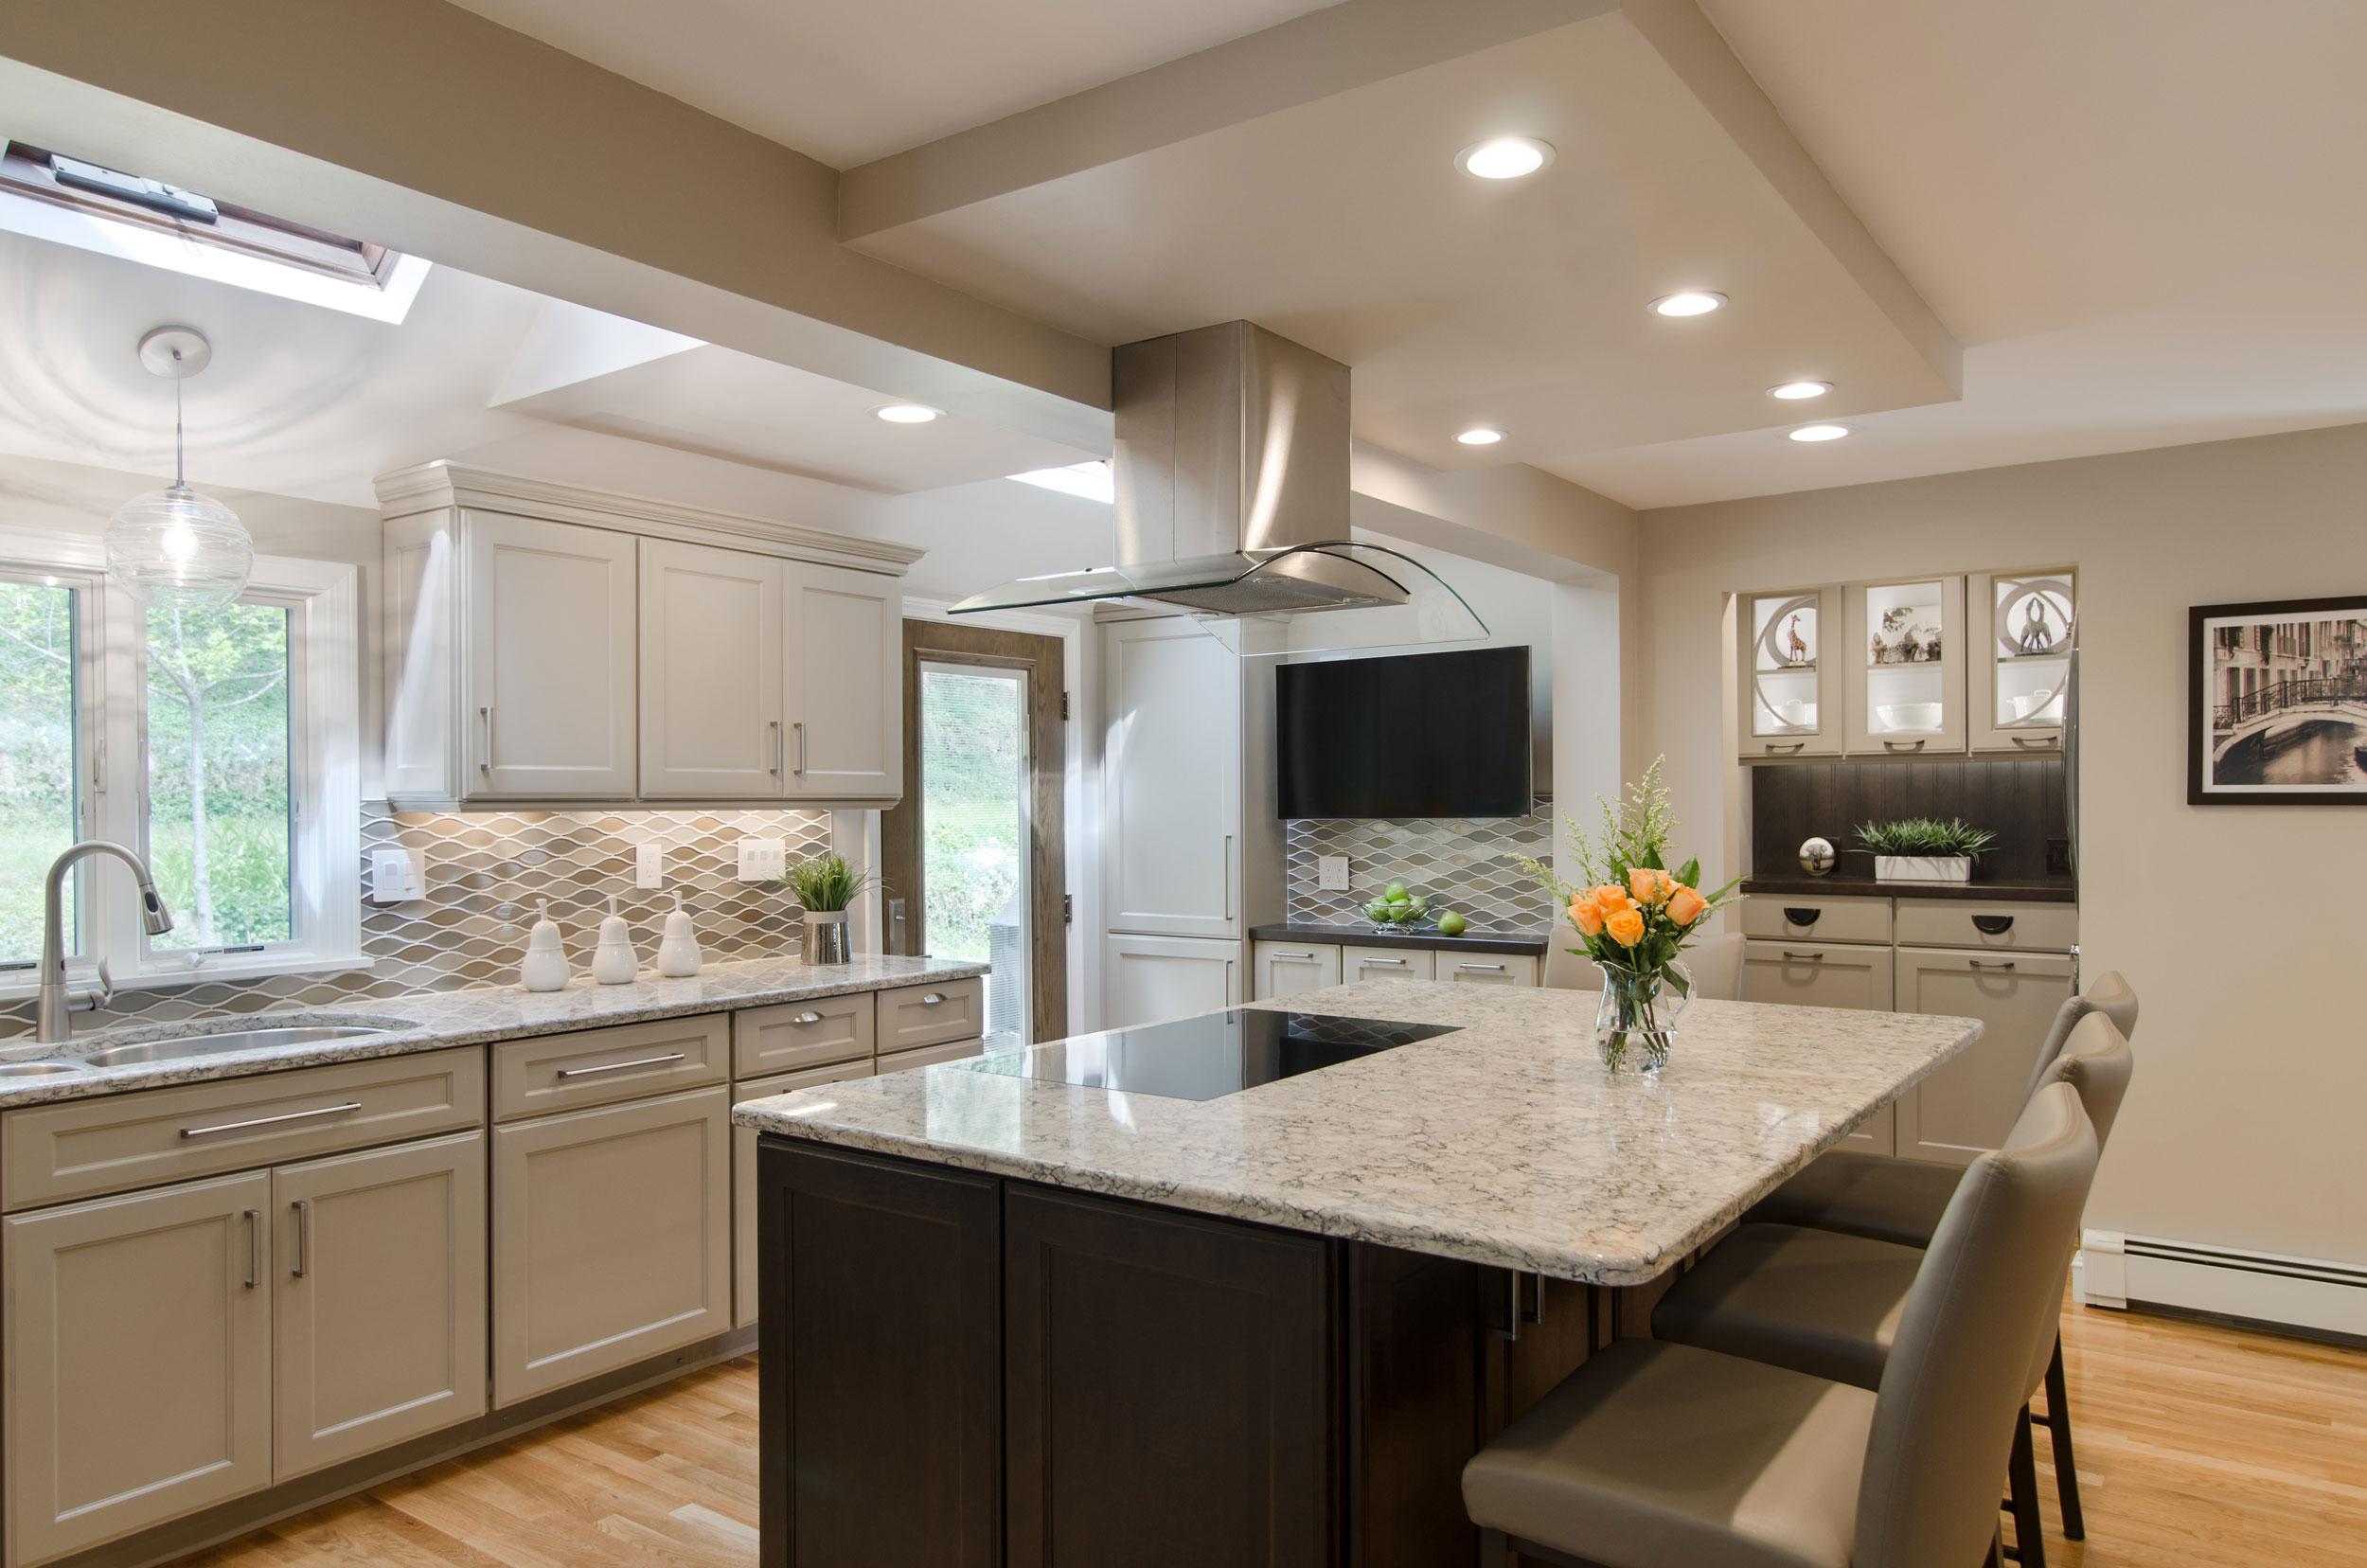 Revitalized kitchen in Braintree, MA